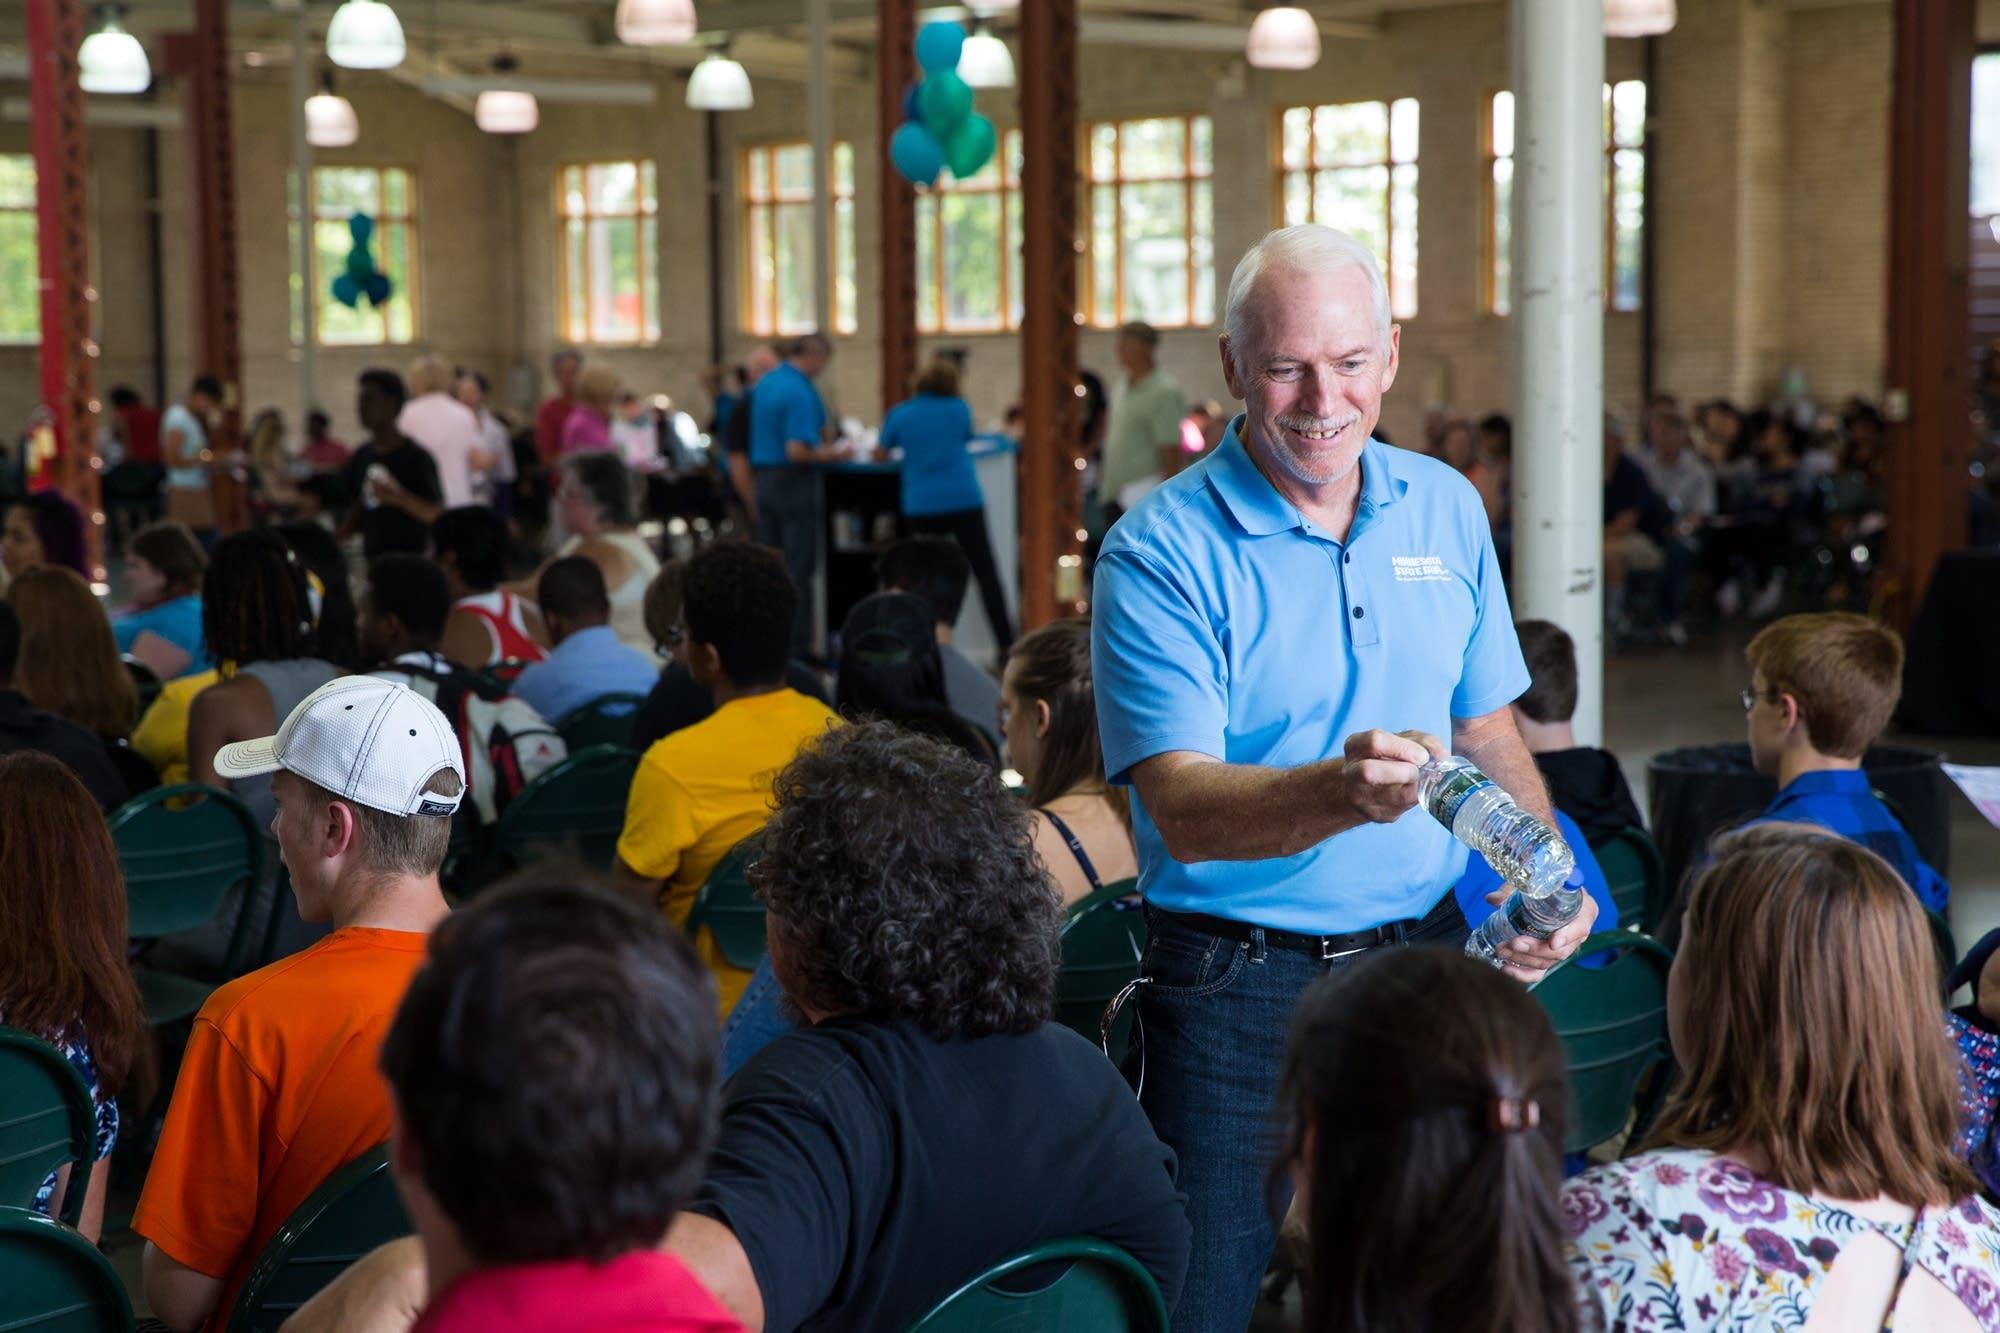 Minnesota State Fair Executive Vice President Jerry Hammer